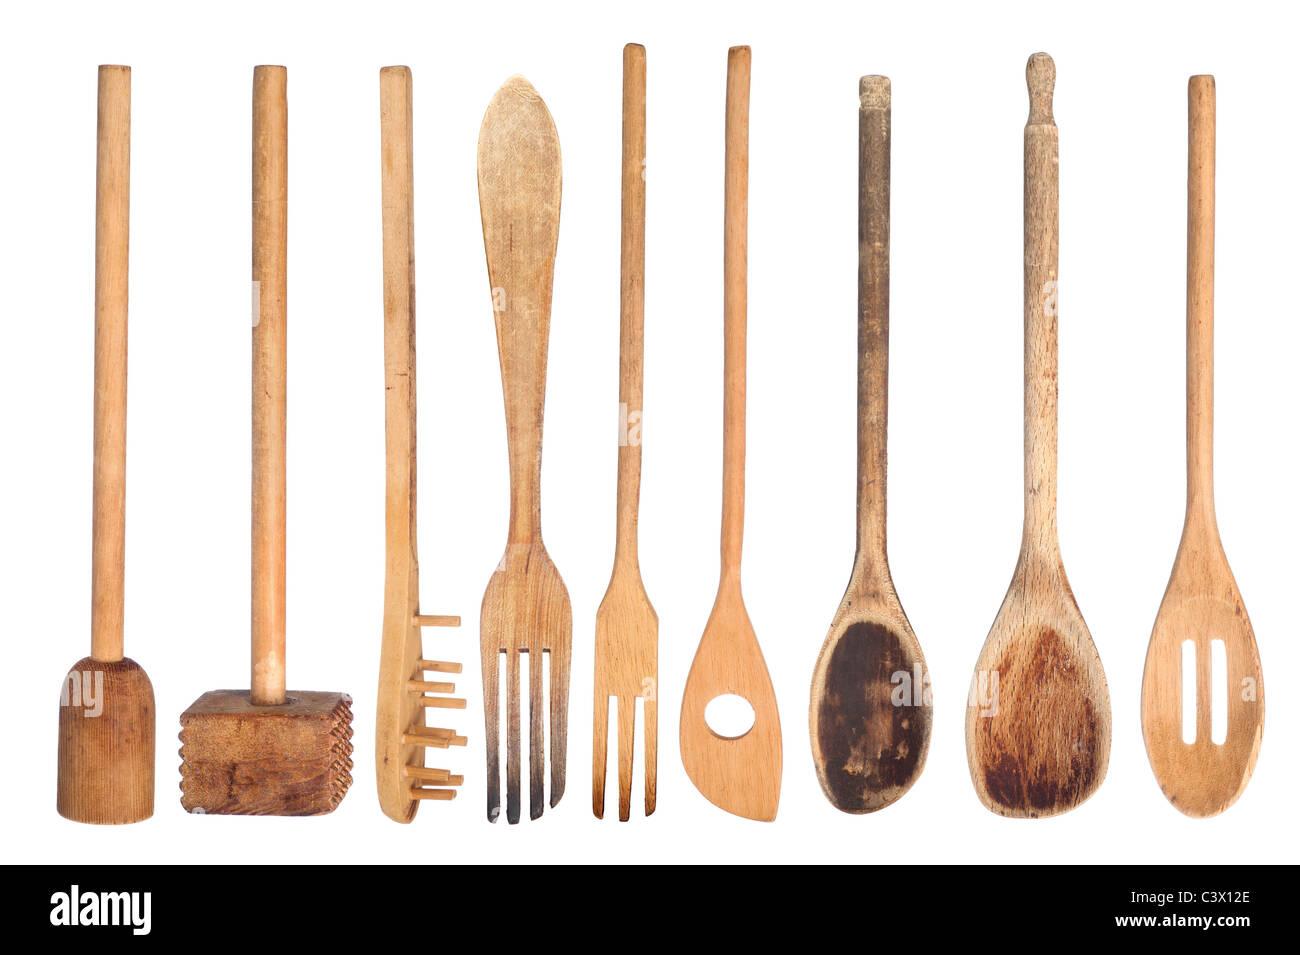 Kitchen Utensils Stock Photos & Kitchen Utensils Stock Images - Alamy